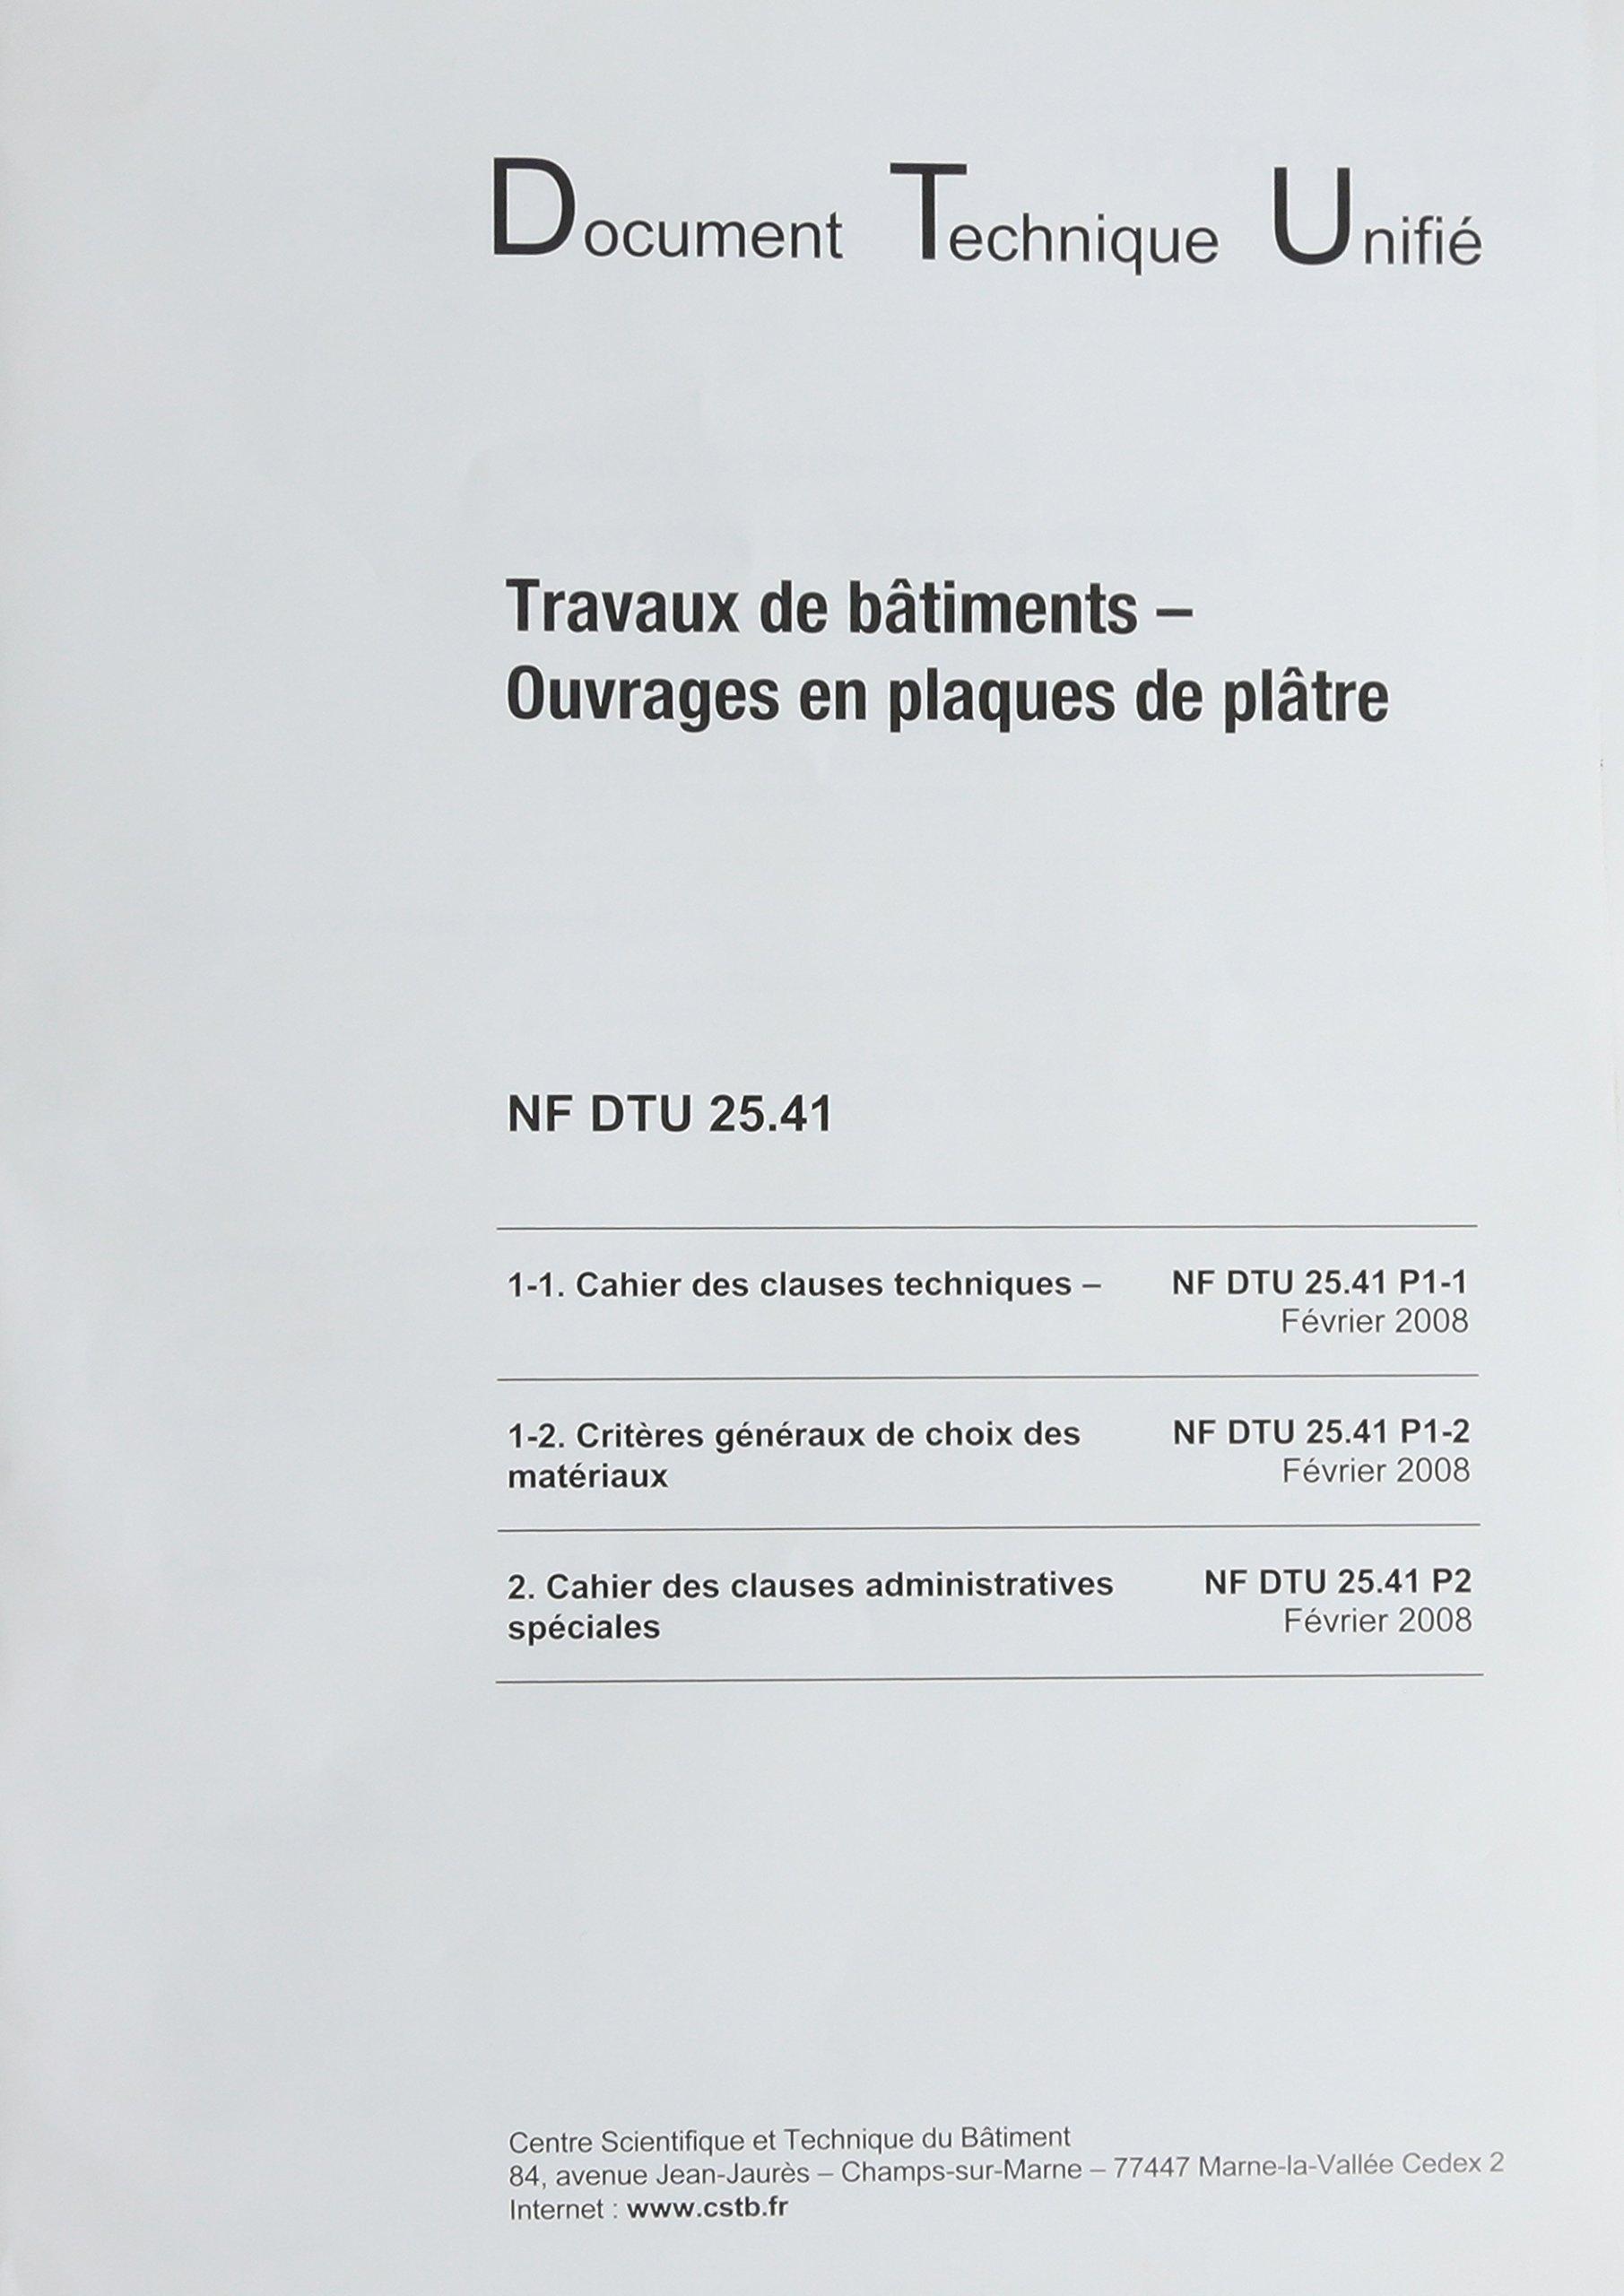 dtu 25-41